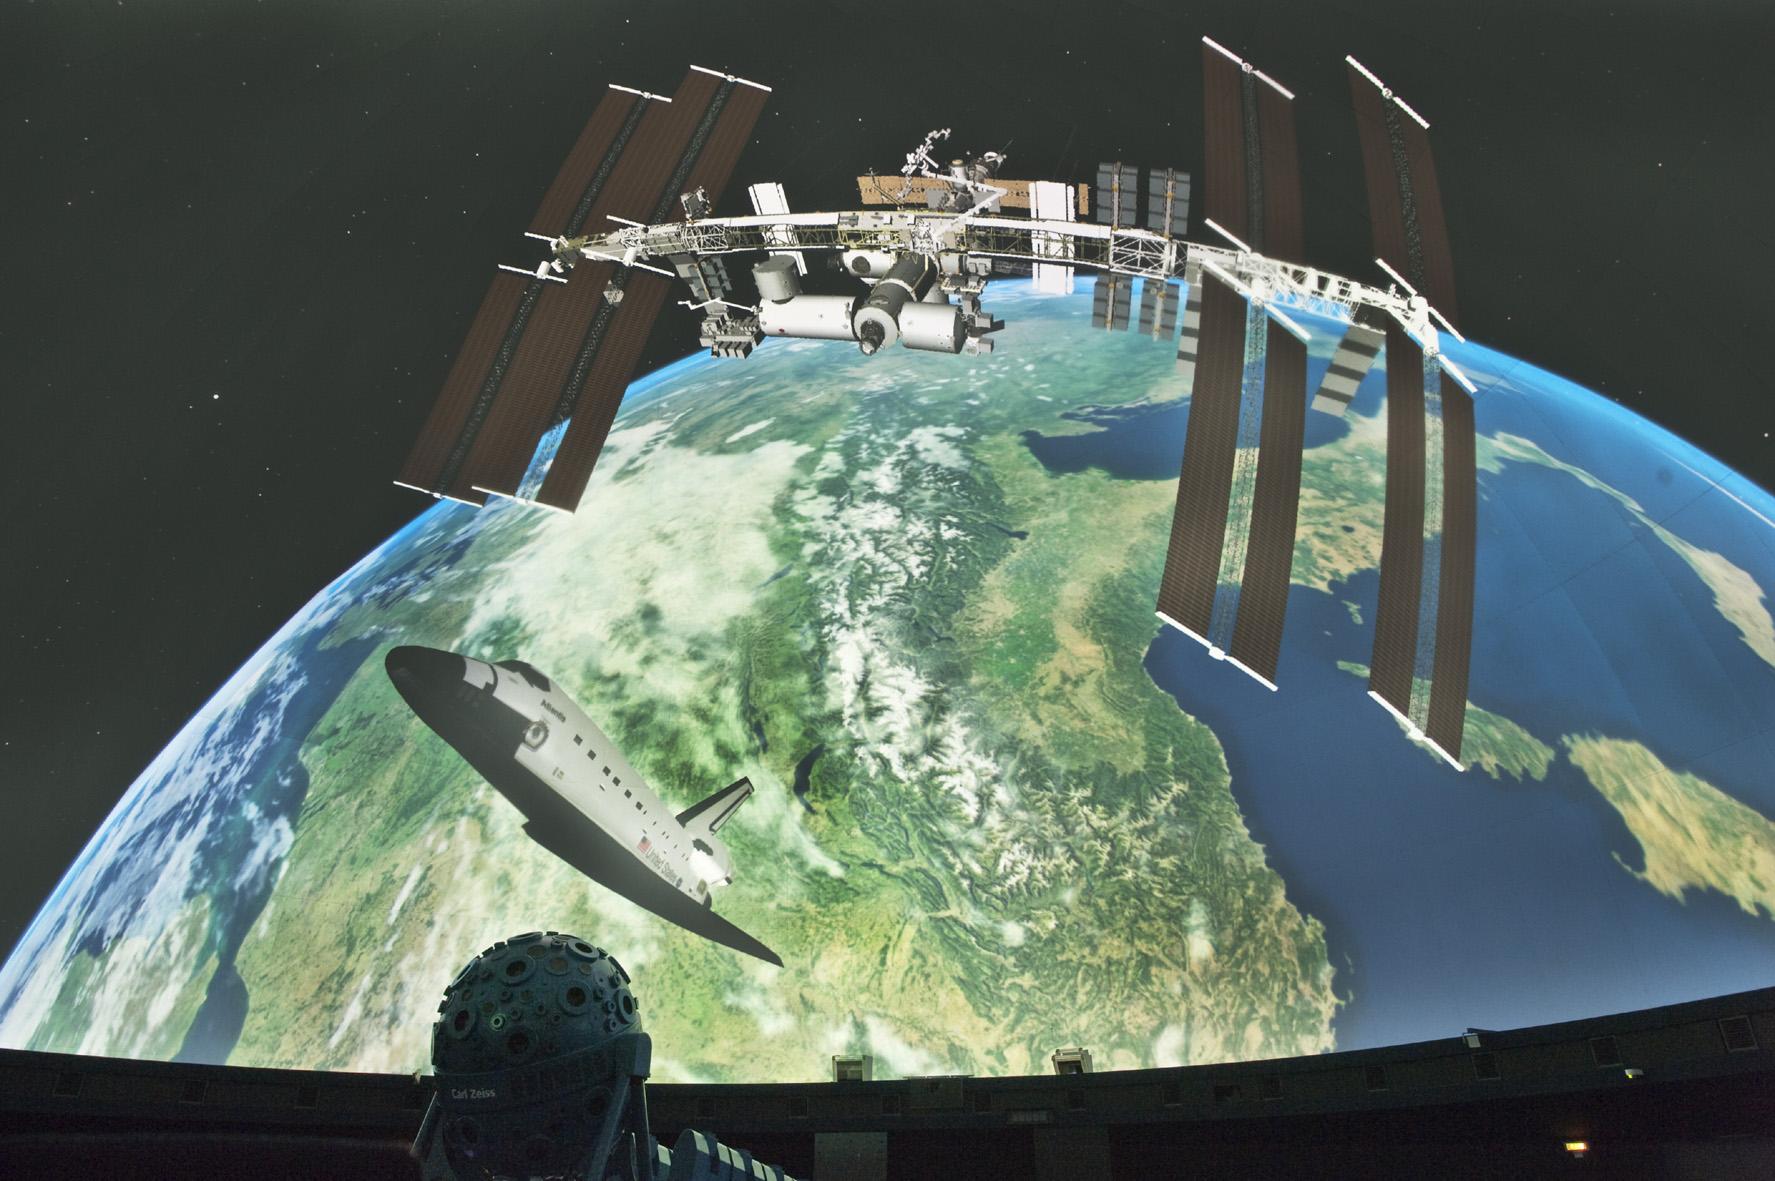 Bilddatei: ISS-kl(c)oblonczyk_12.jpg